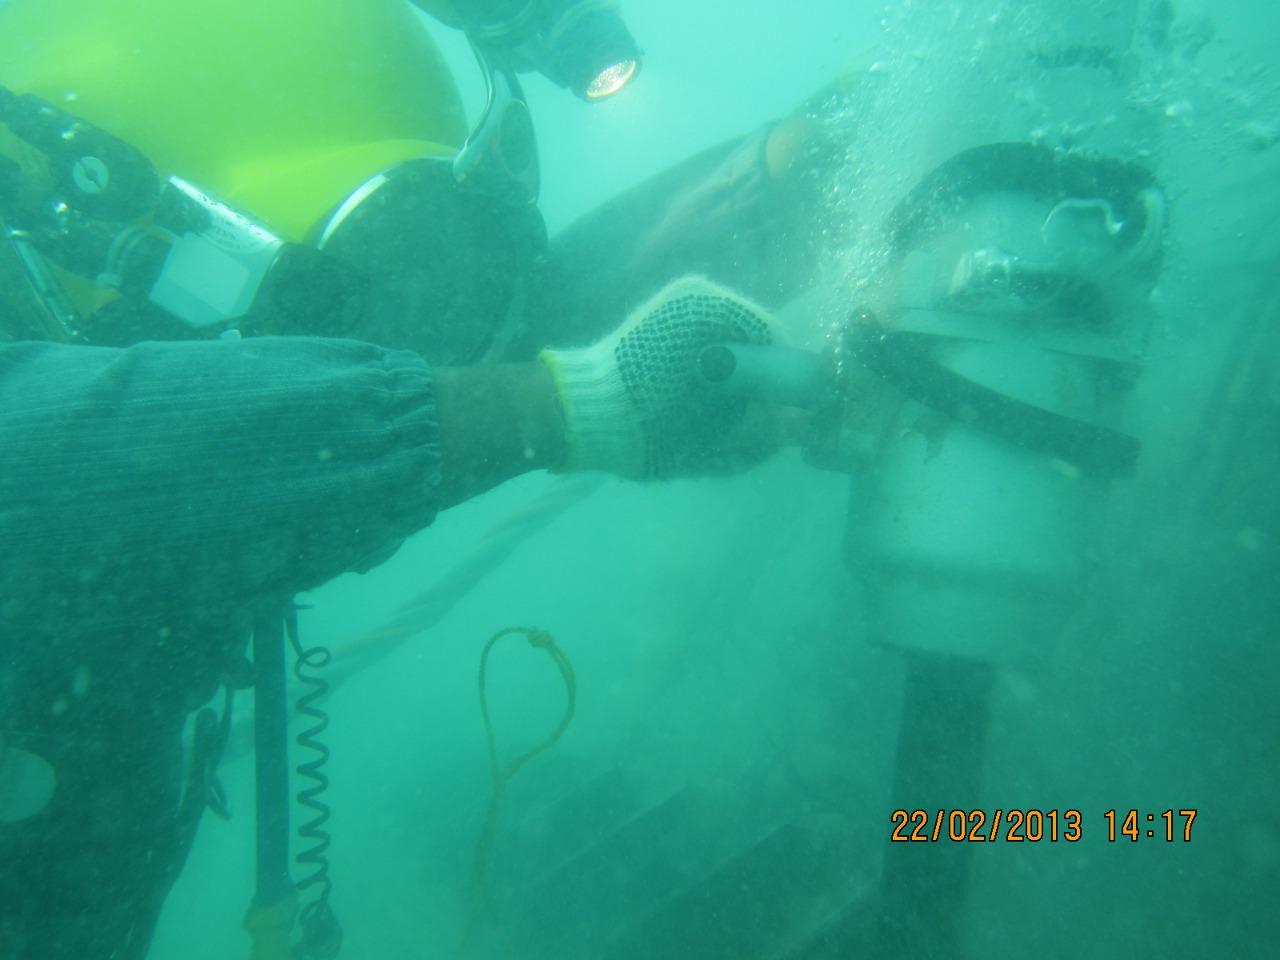 PT-Cakrawala-Amartha-Jaya-Underwater-Work